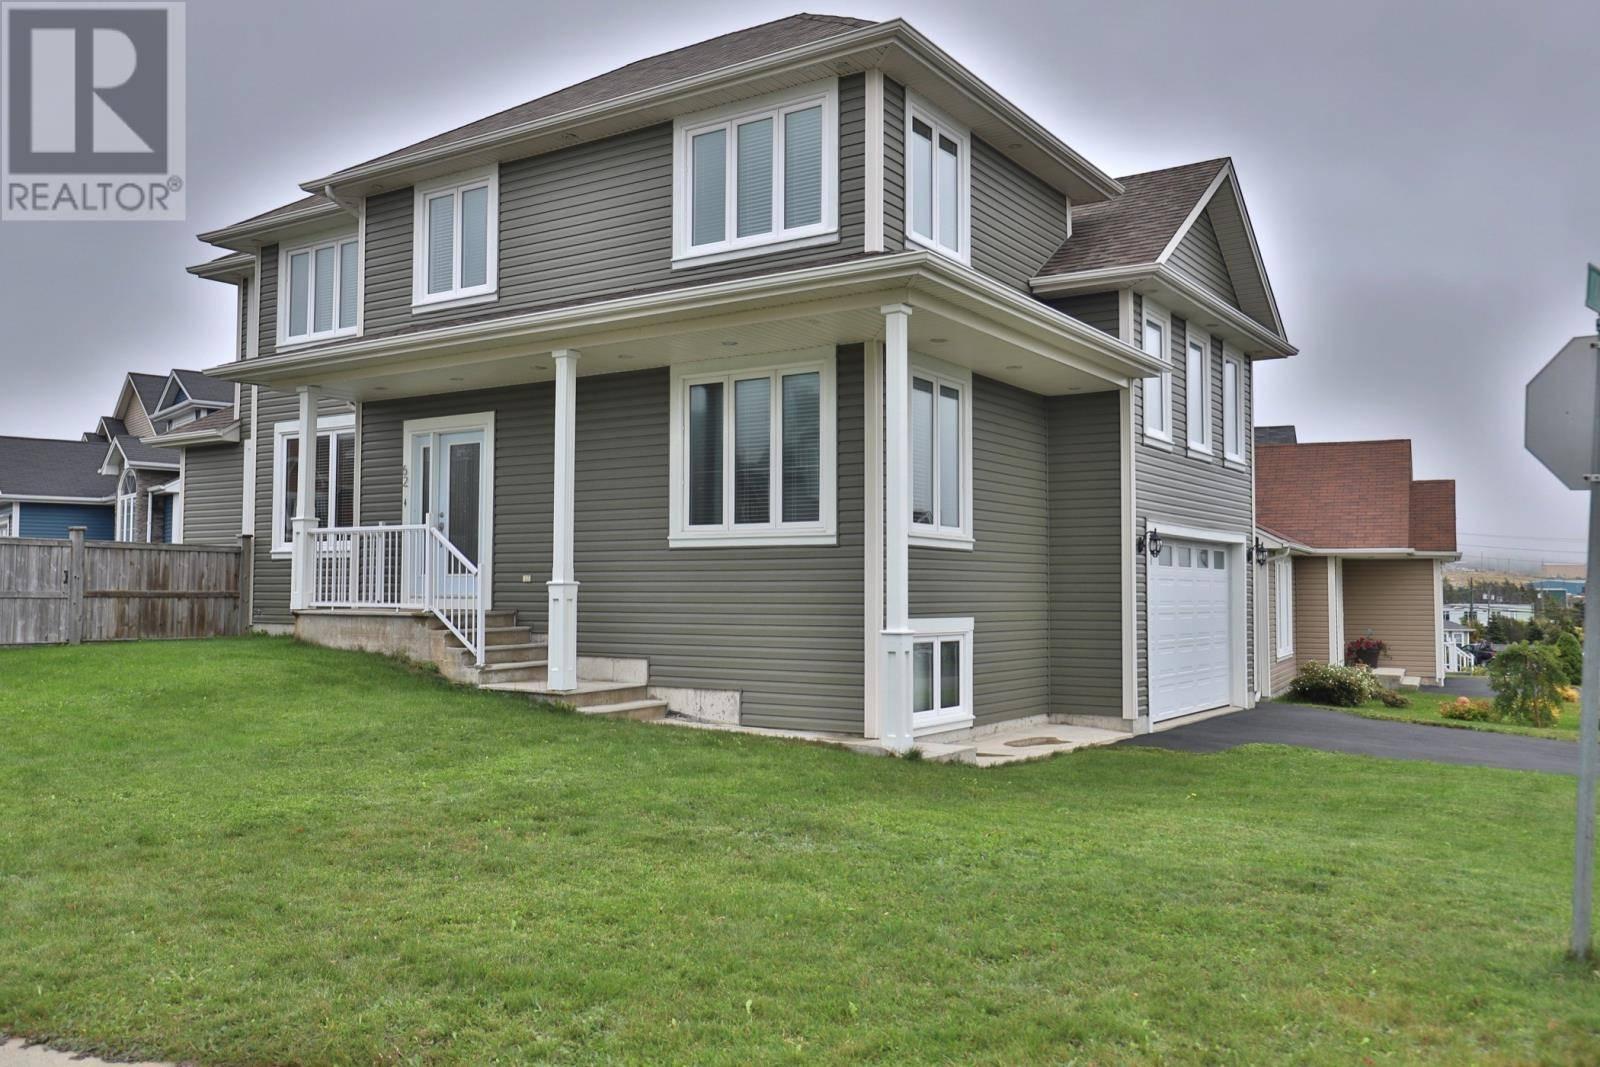 House for sale at 62 Julieann Pl St. John's Newfoundland - MLS: 1204695